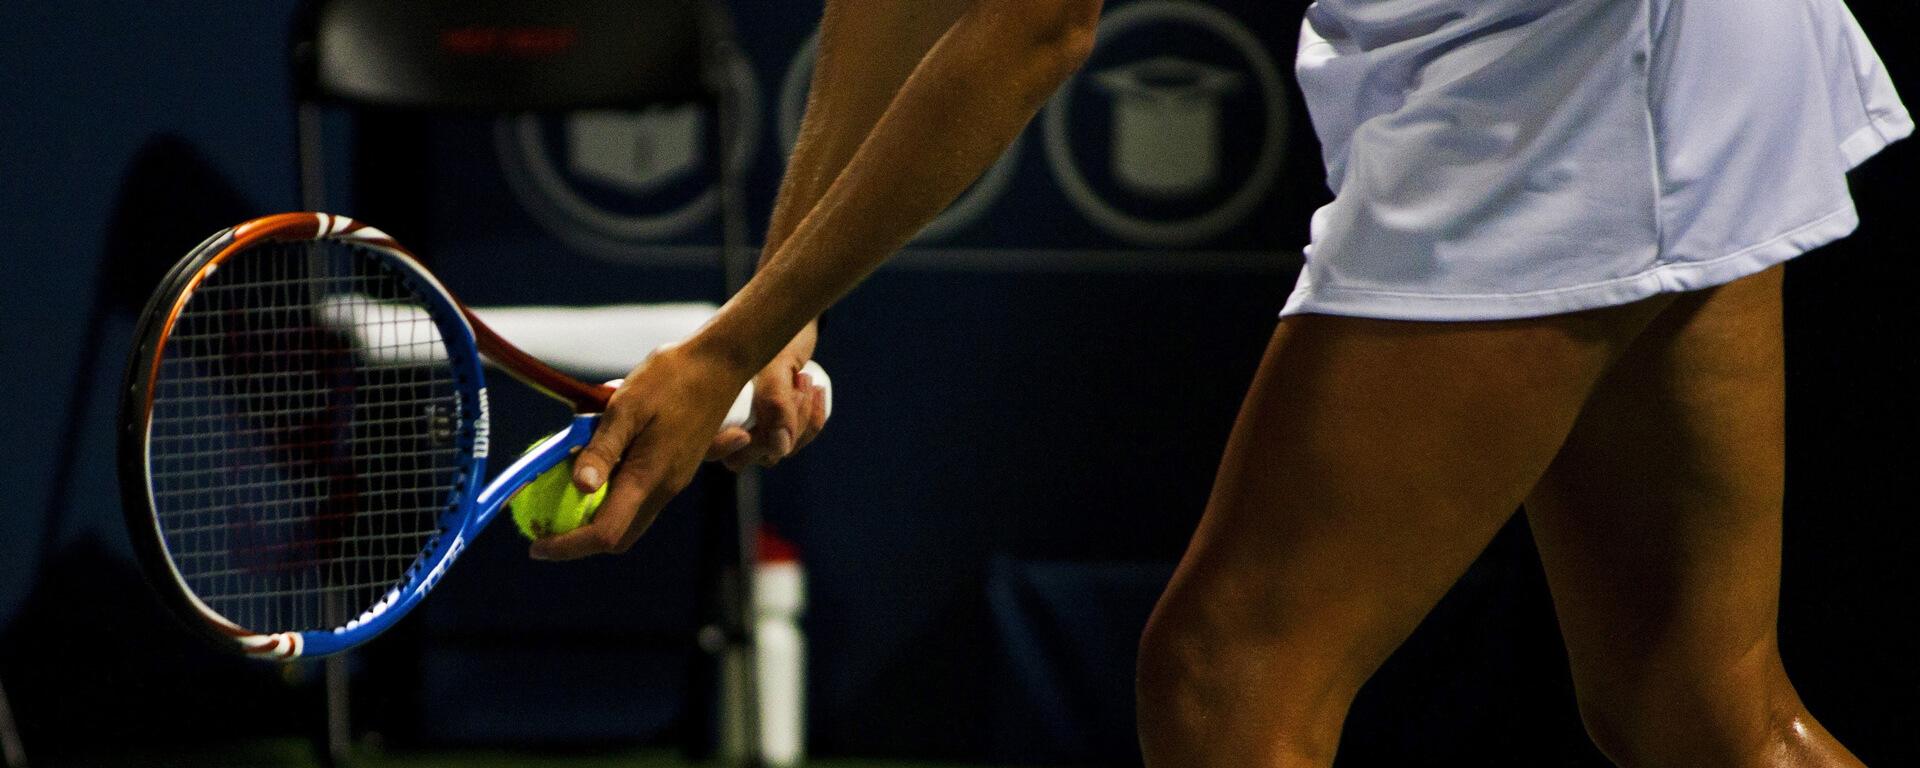 Nike W Pure tenniskjol - WHITE BLACK - Intersport 193d8014781cd